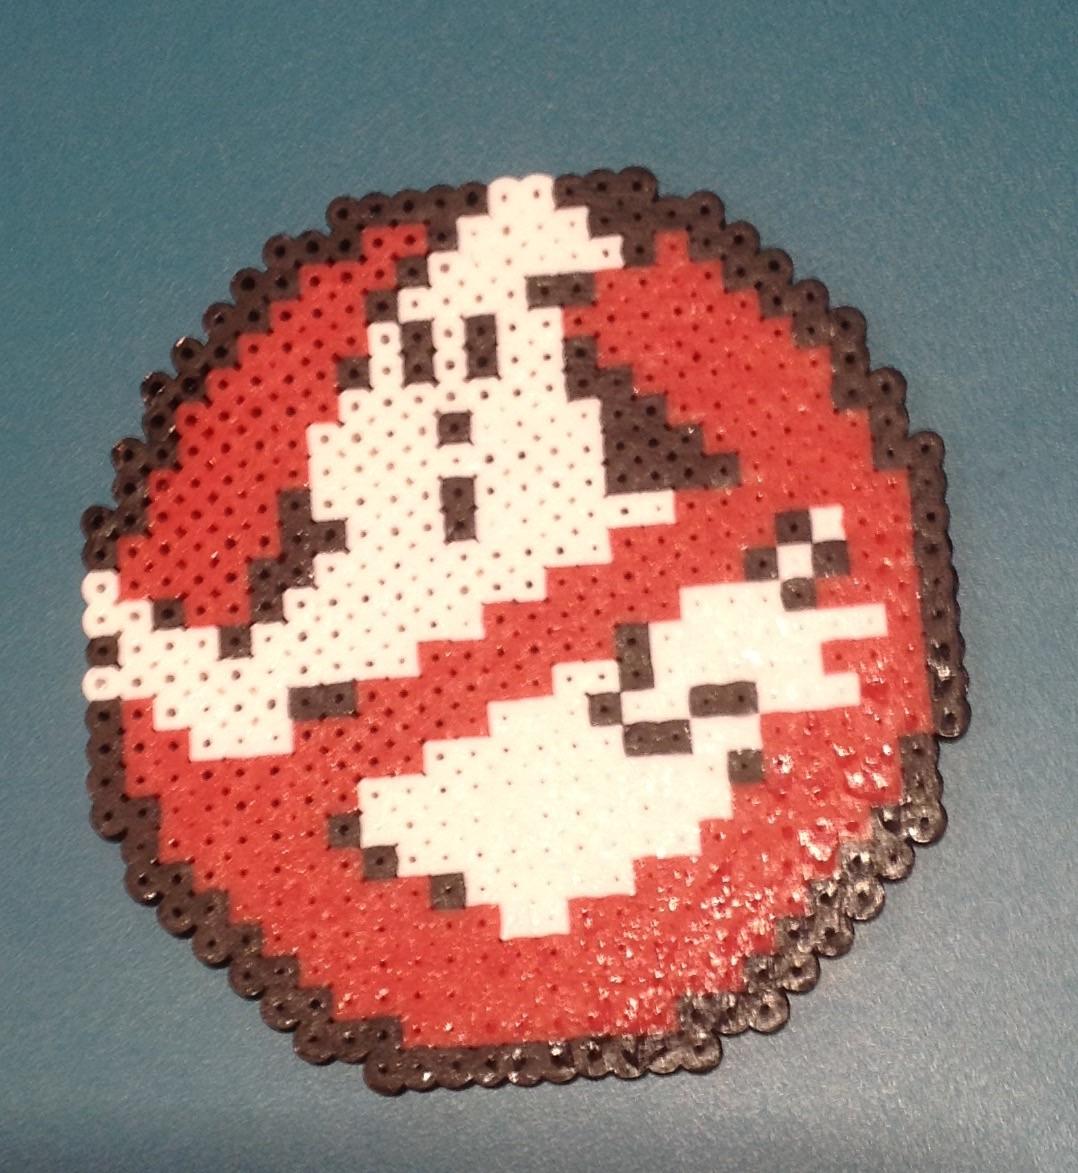 Ghostbusters Perler Bead Art